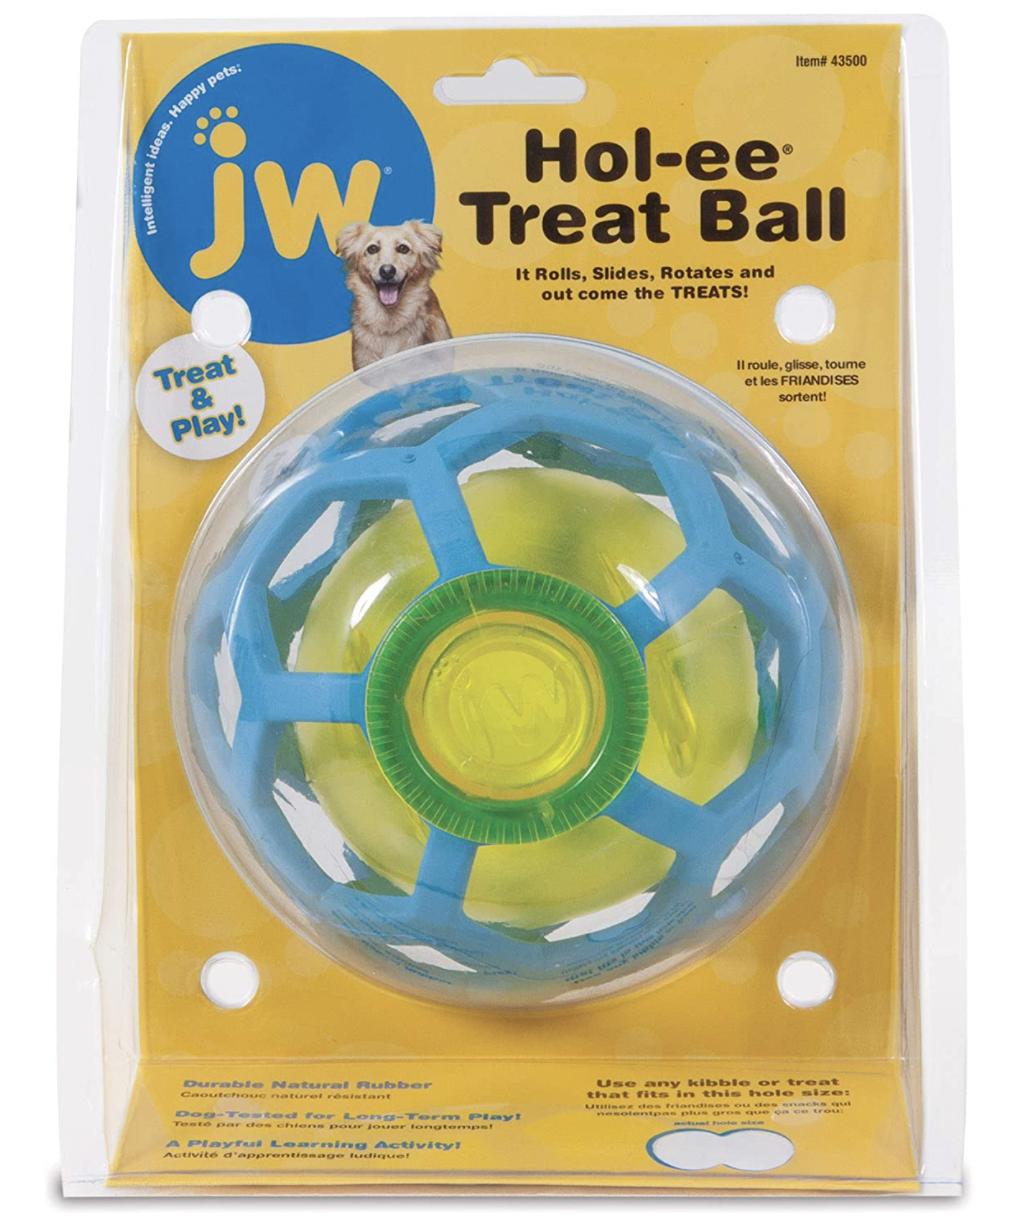 JW Hol-ee Treat Ball